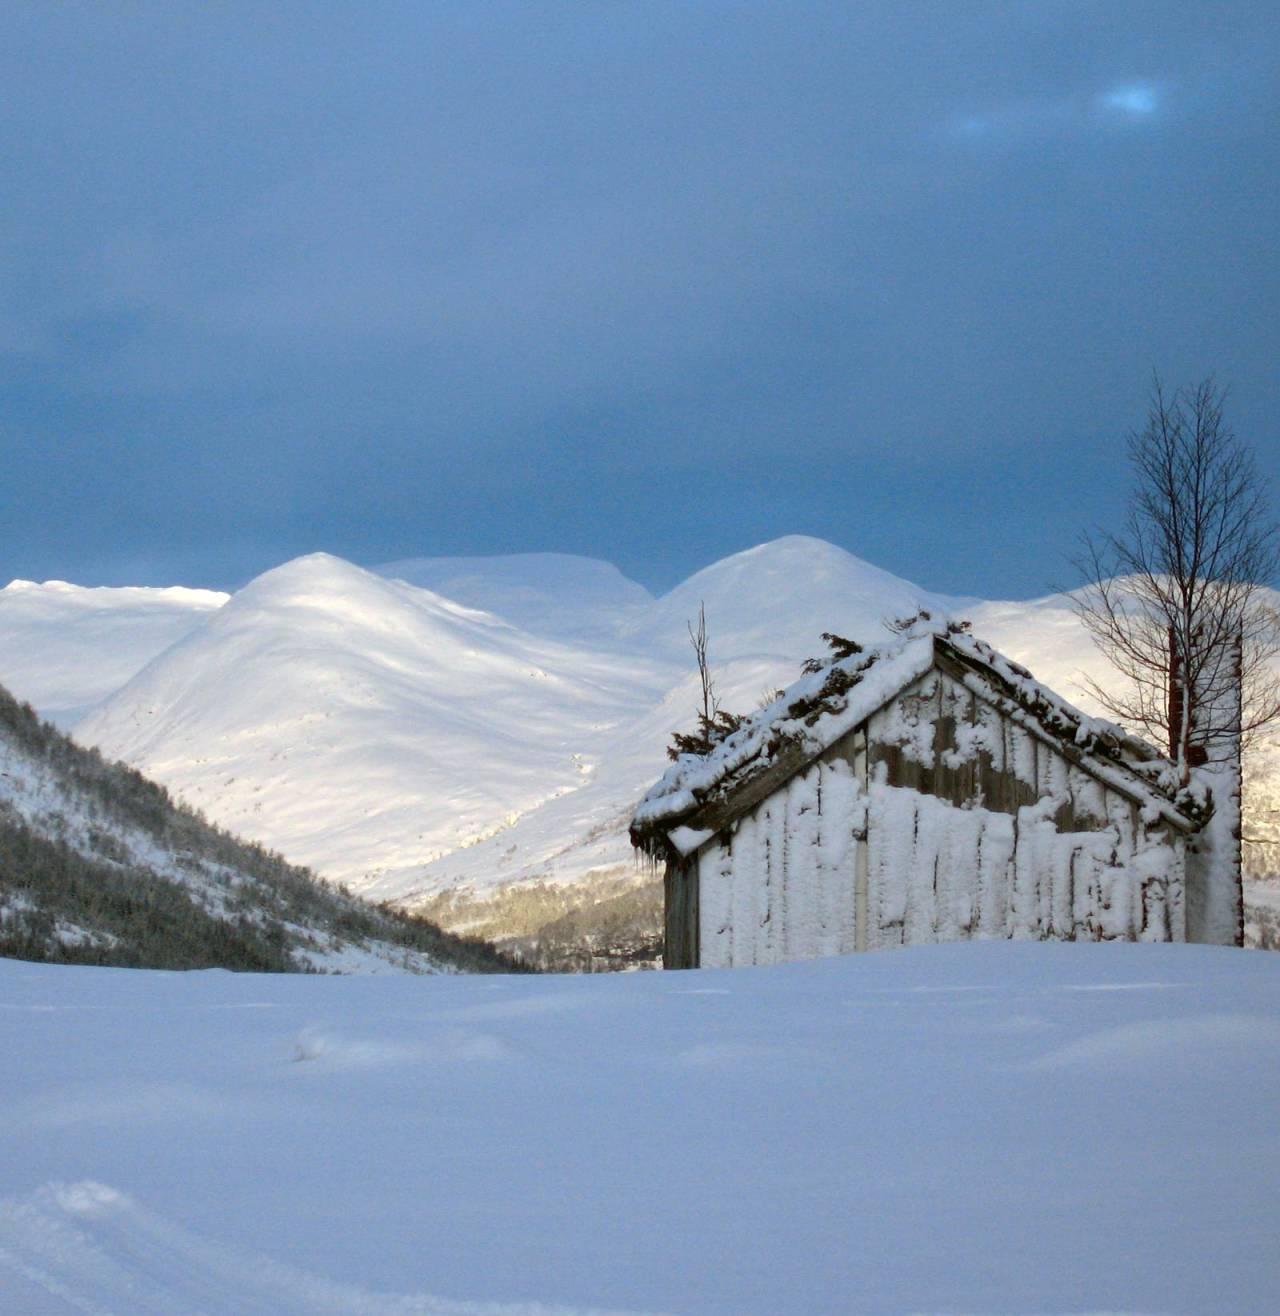 """Isdronninga"" sett frå Dvergsdalsdalen. Foto: Torje Bjellaas. / Toppturar i Sunnfjord."